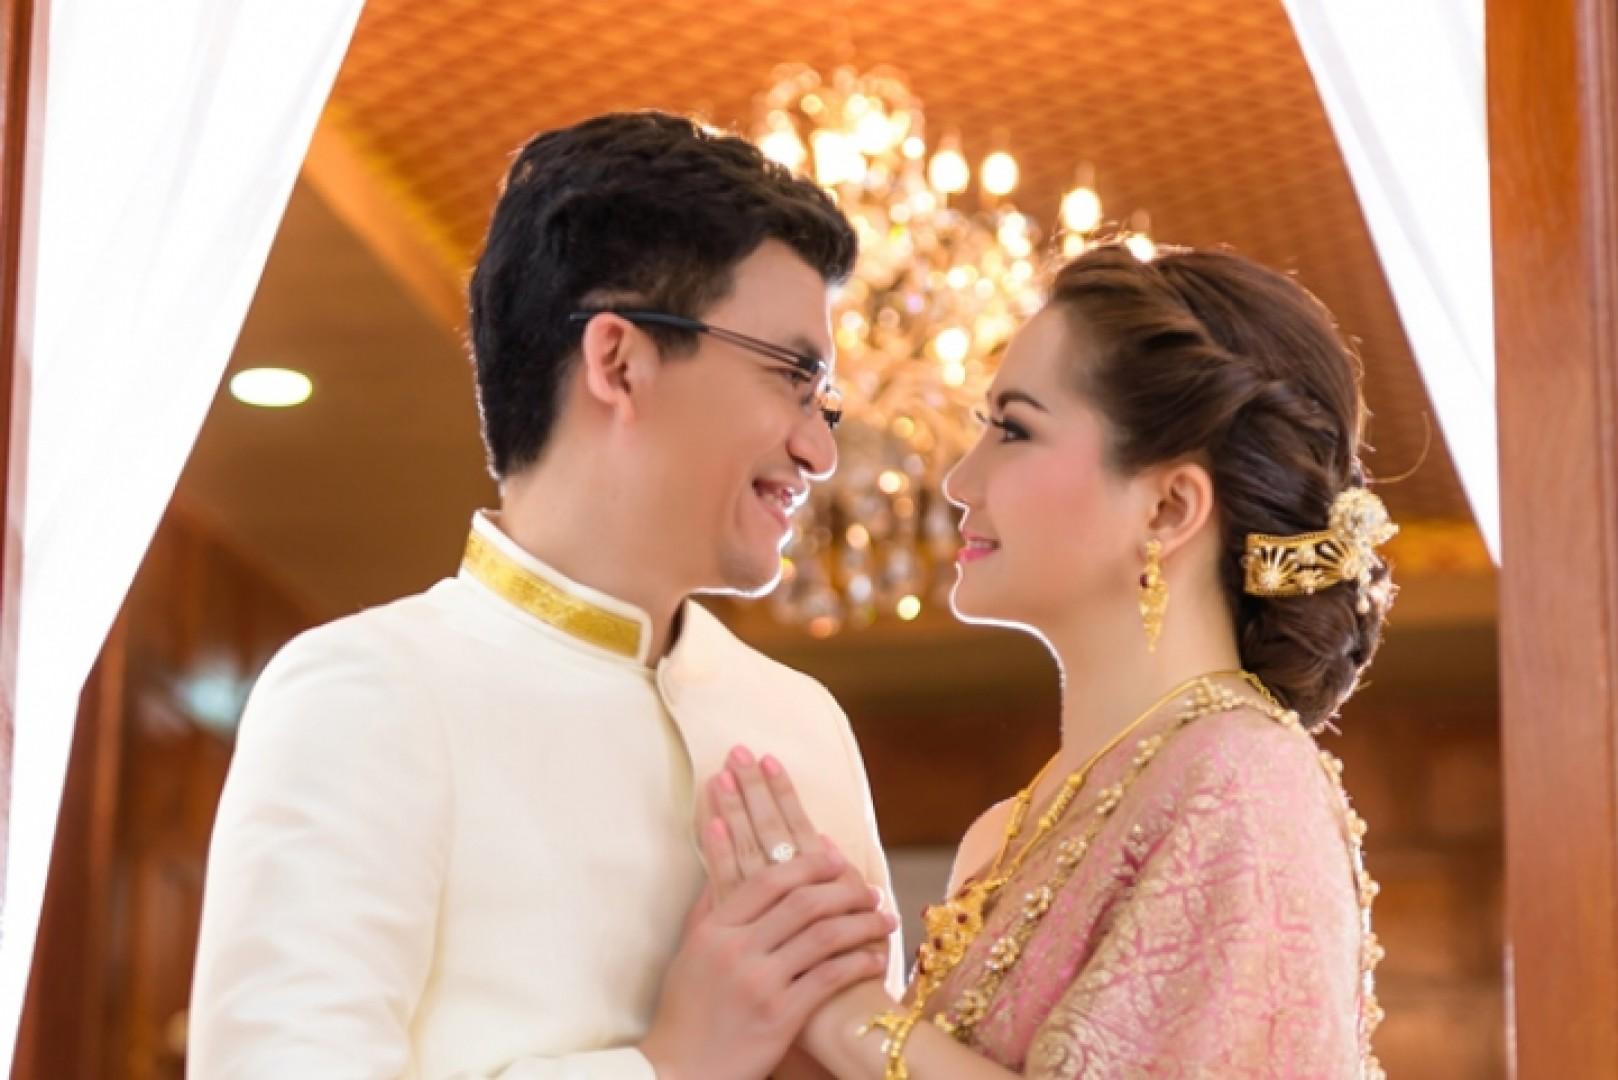 The Odeum Bangkok